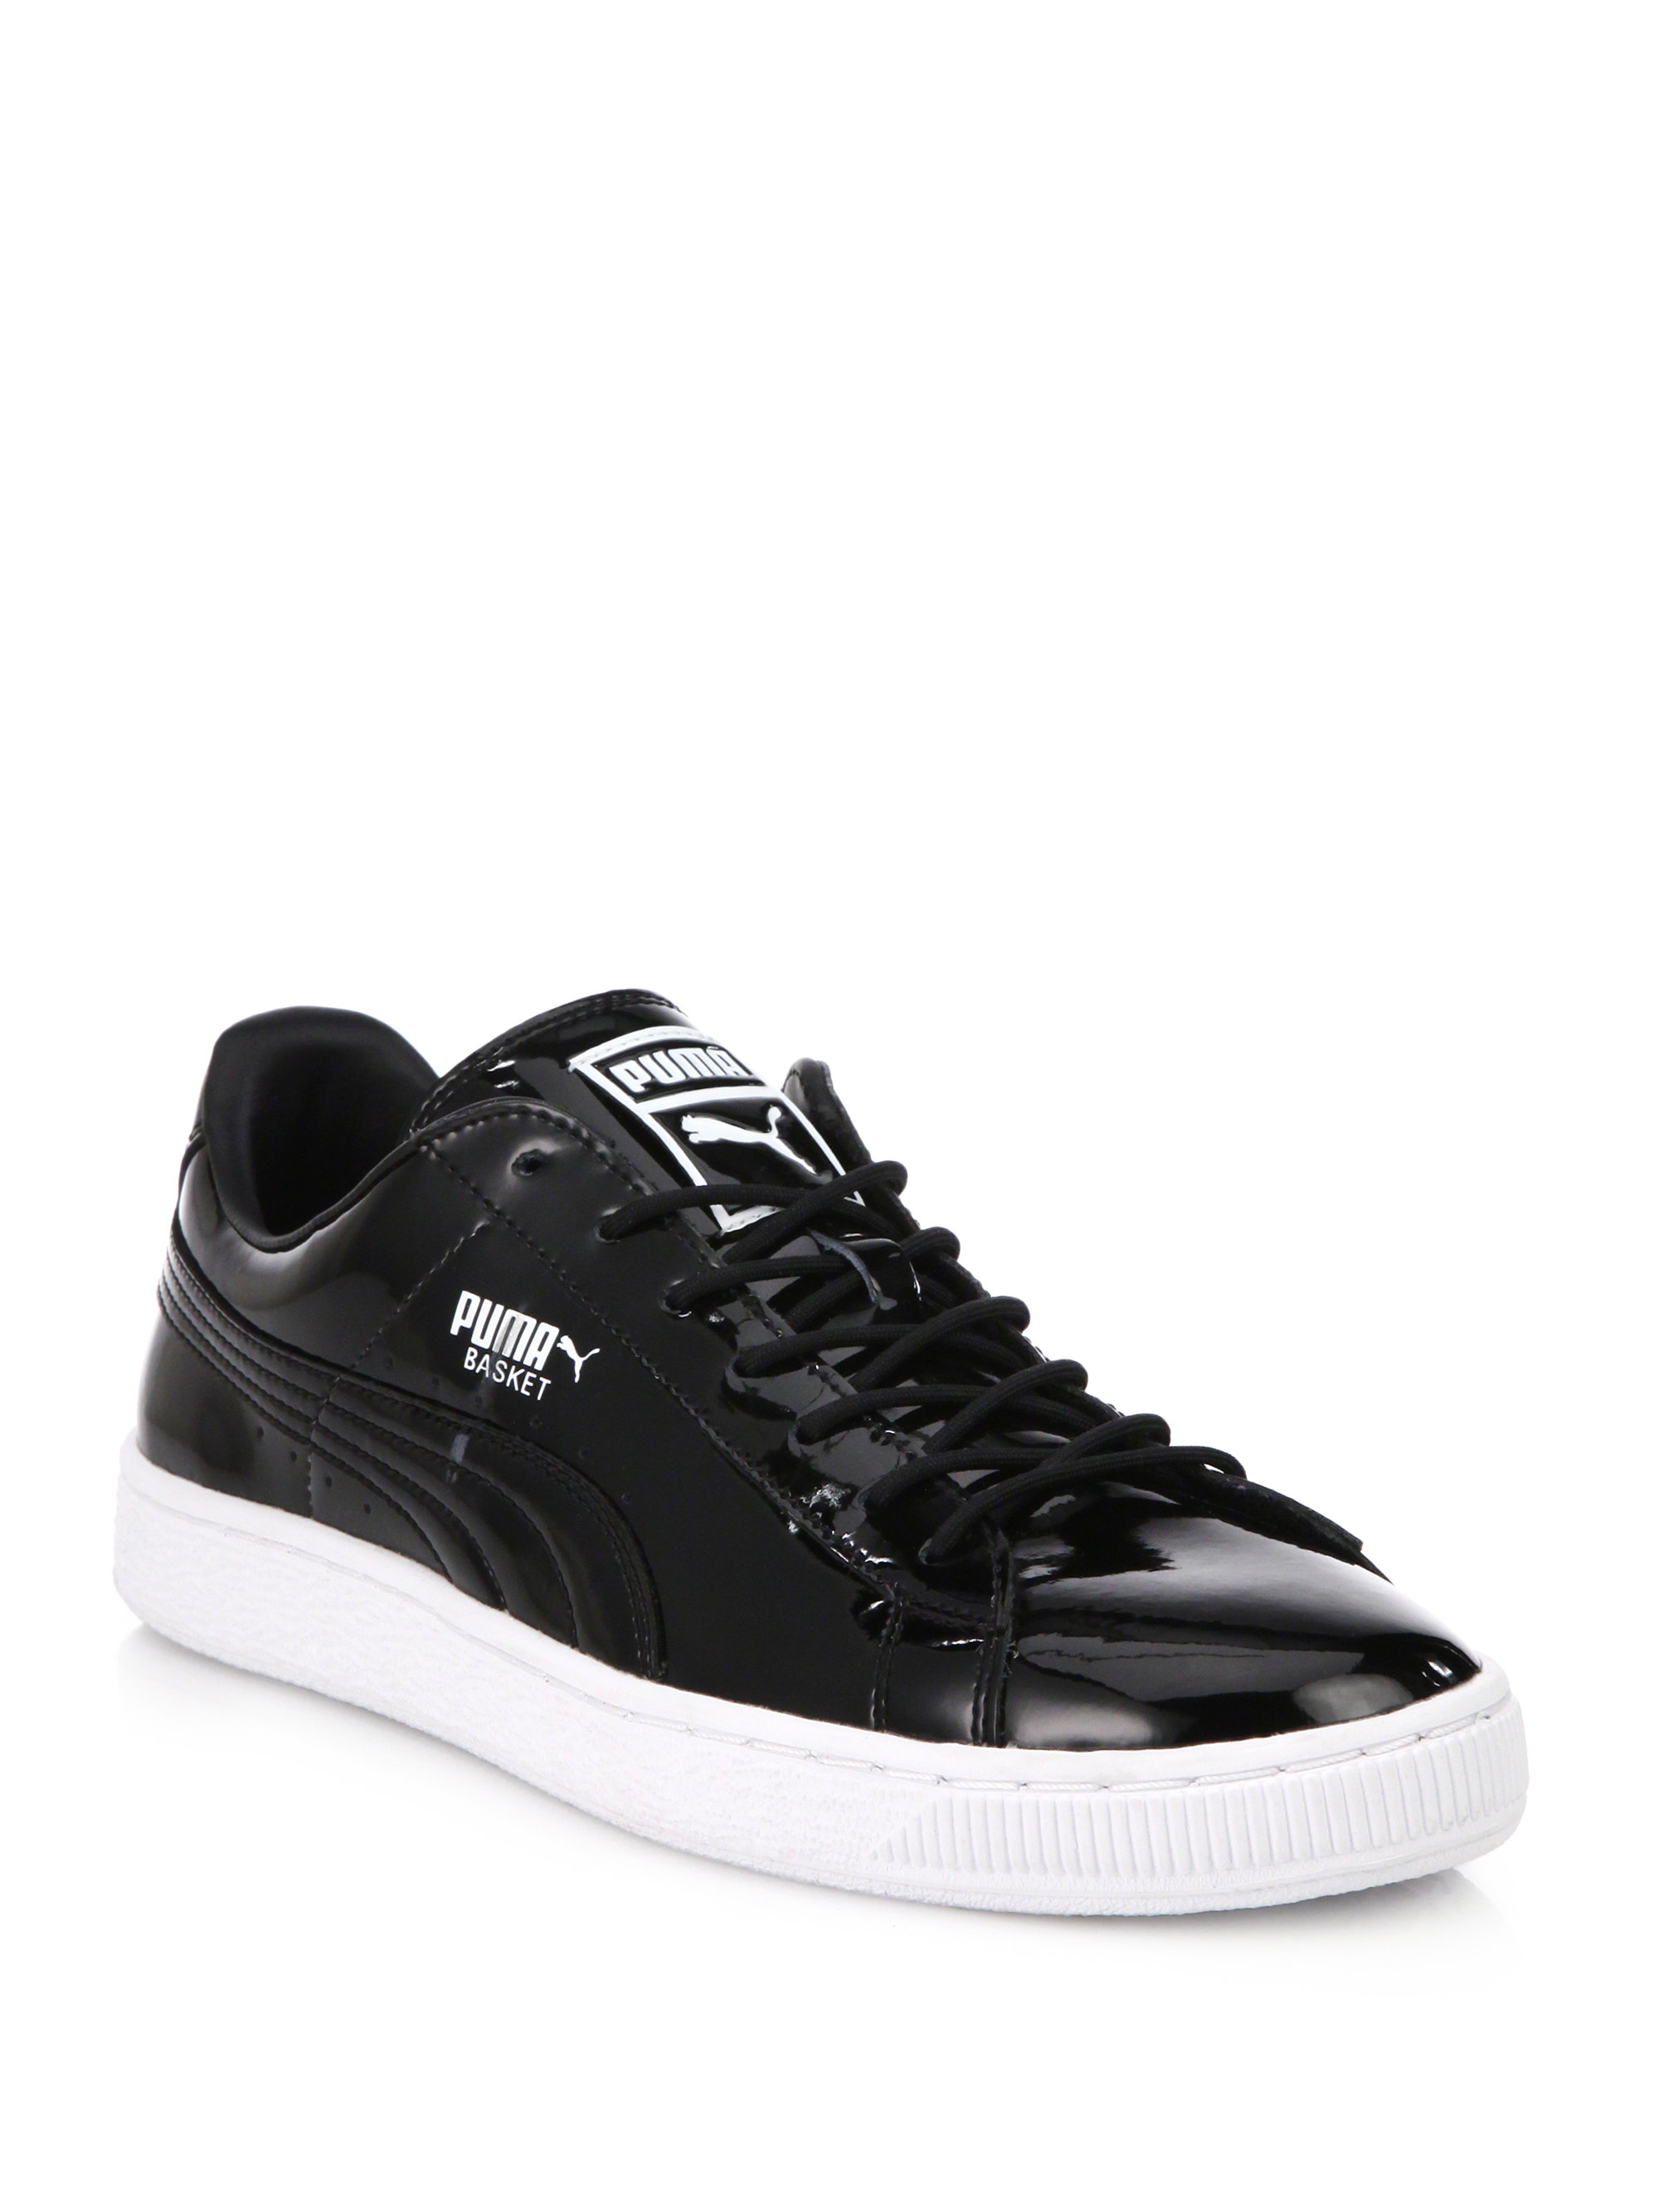 wholesale dealer 731e6 01a42 PUMA Black Basket Patent Leather Sneakers